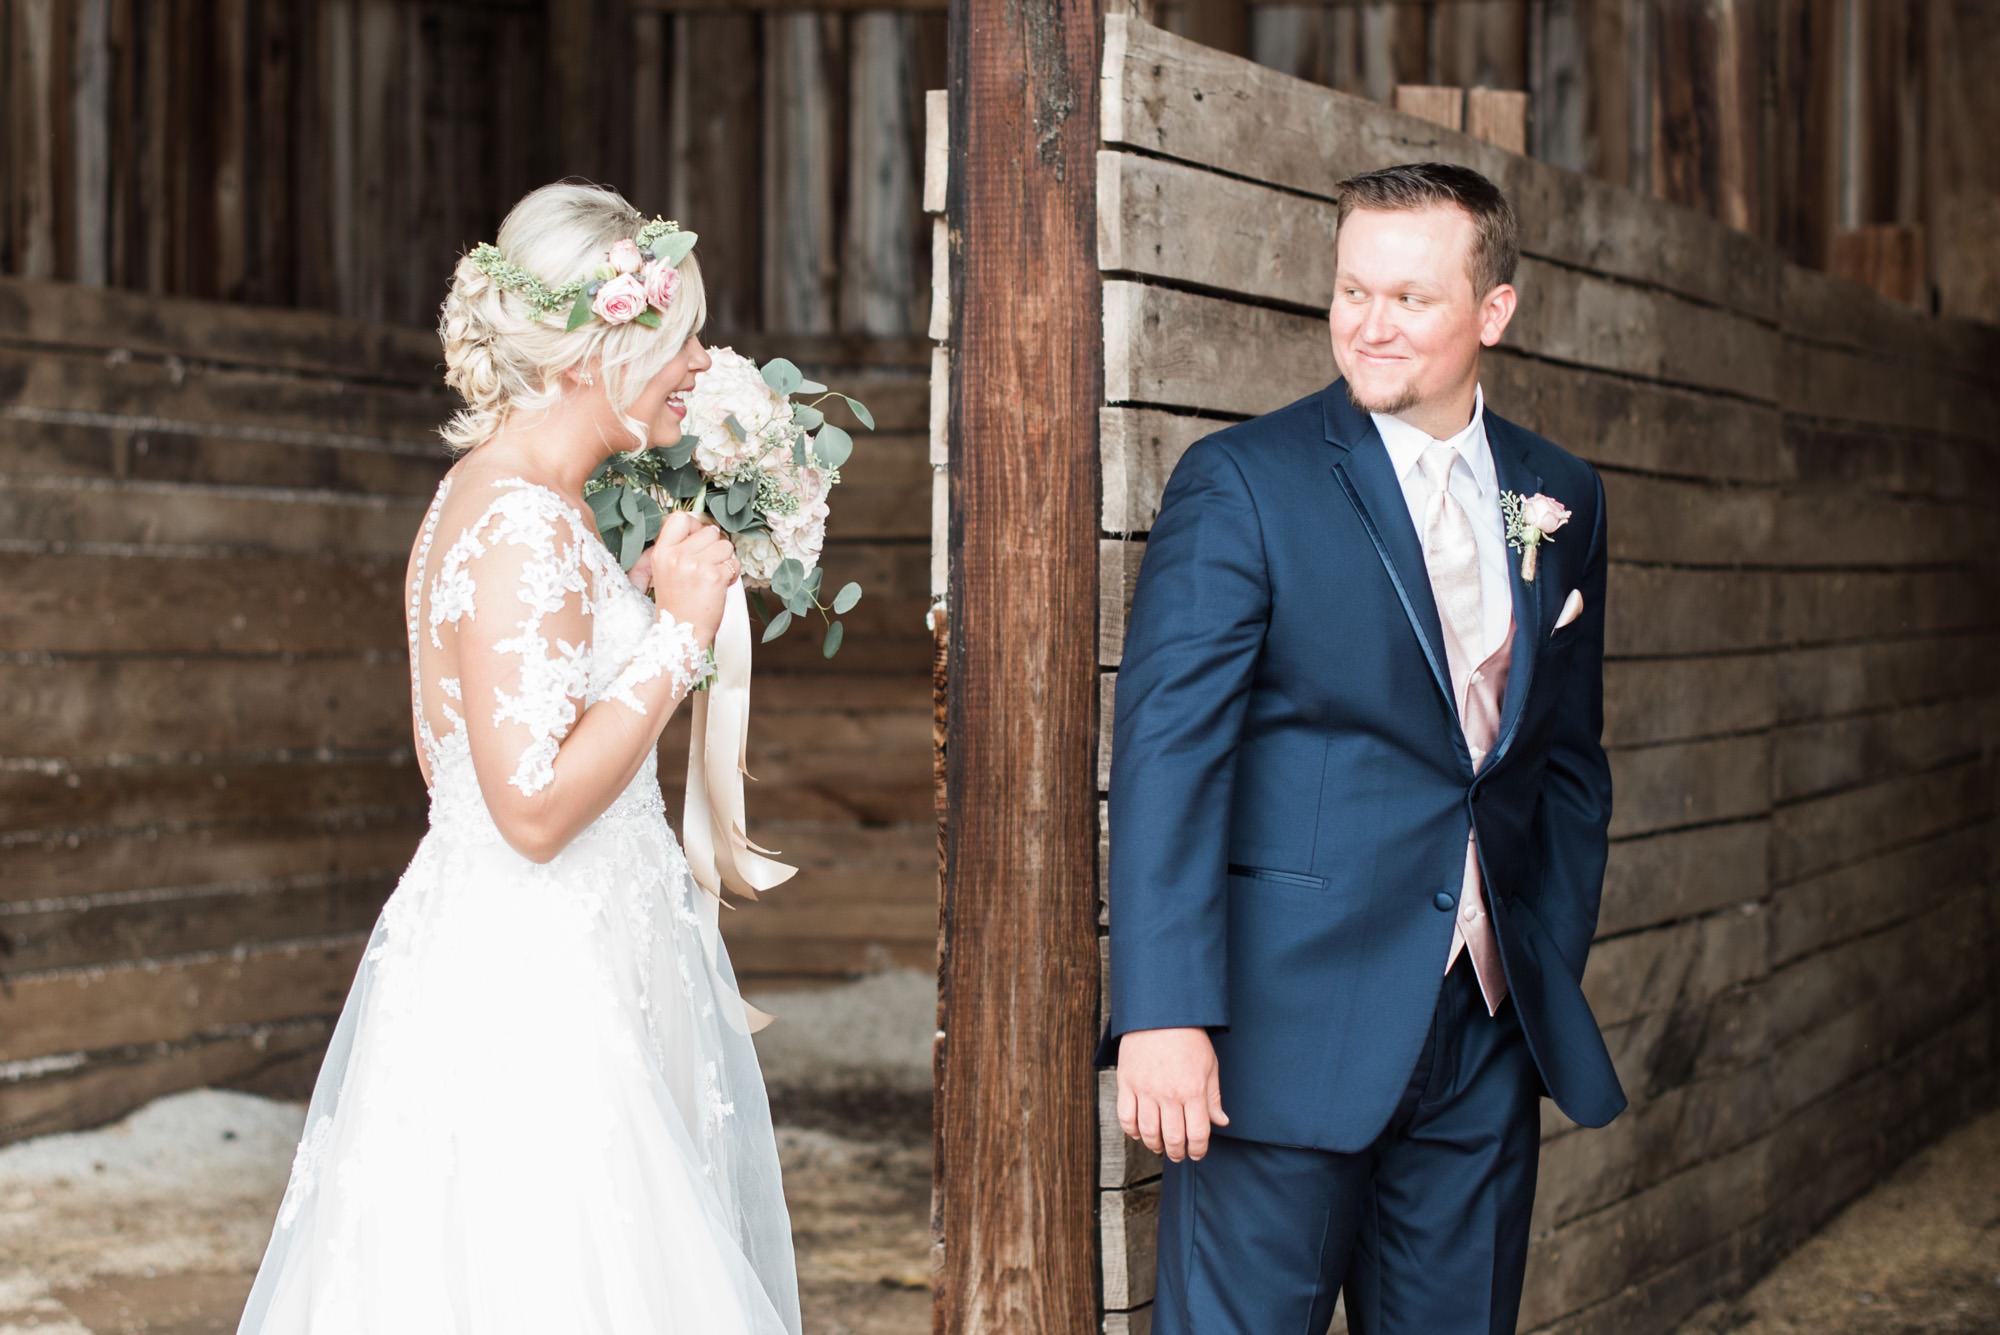 georgia-wedding-first-look-15.jpg